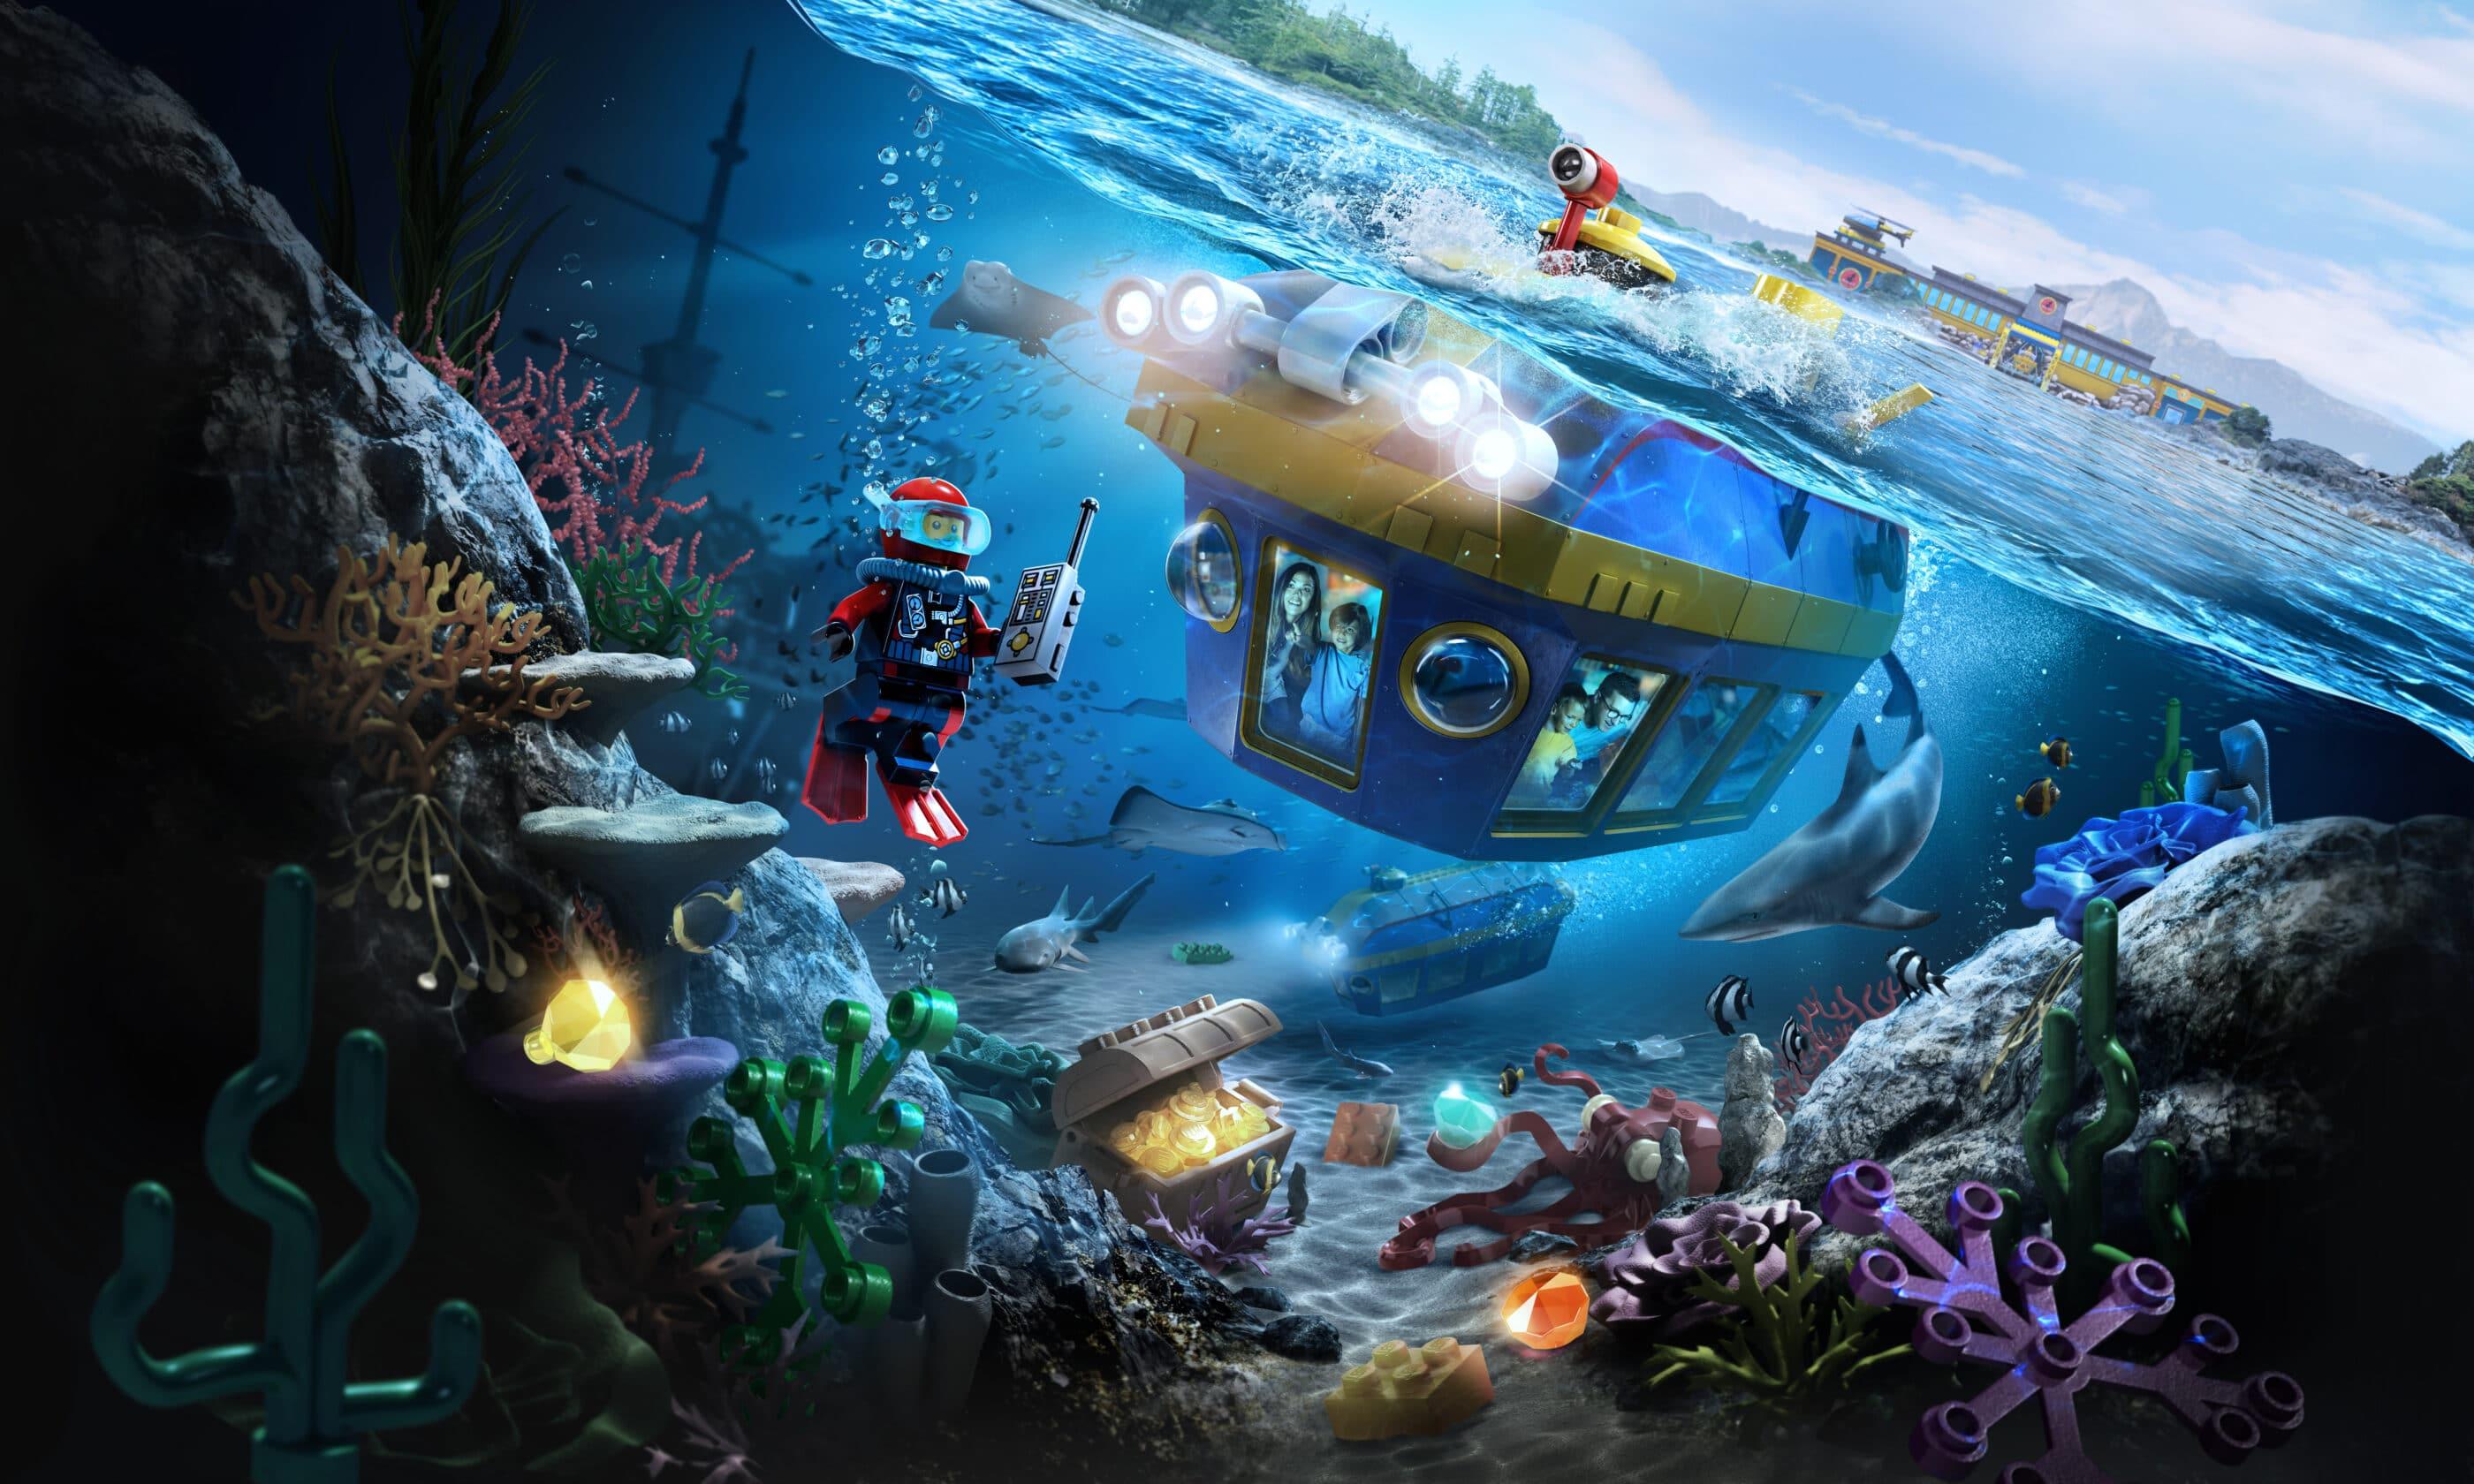 Riders submerge underwater in a submarine during LEGO City Deep Sea Adventure